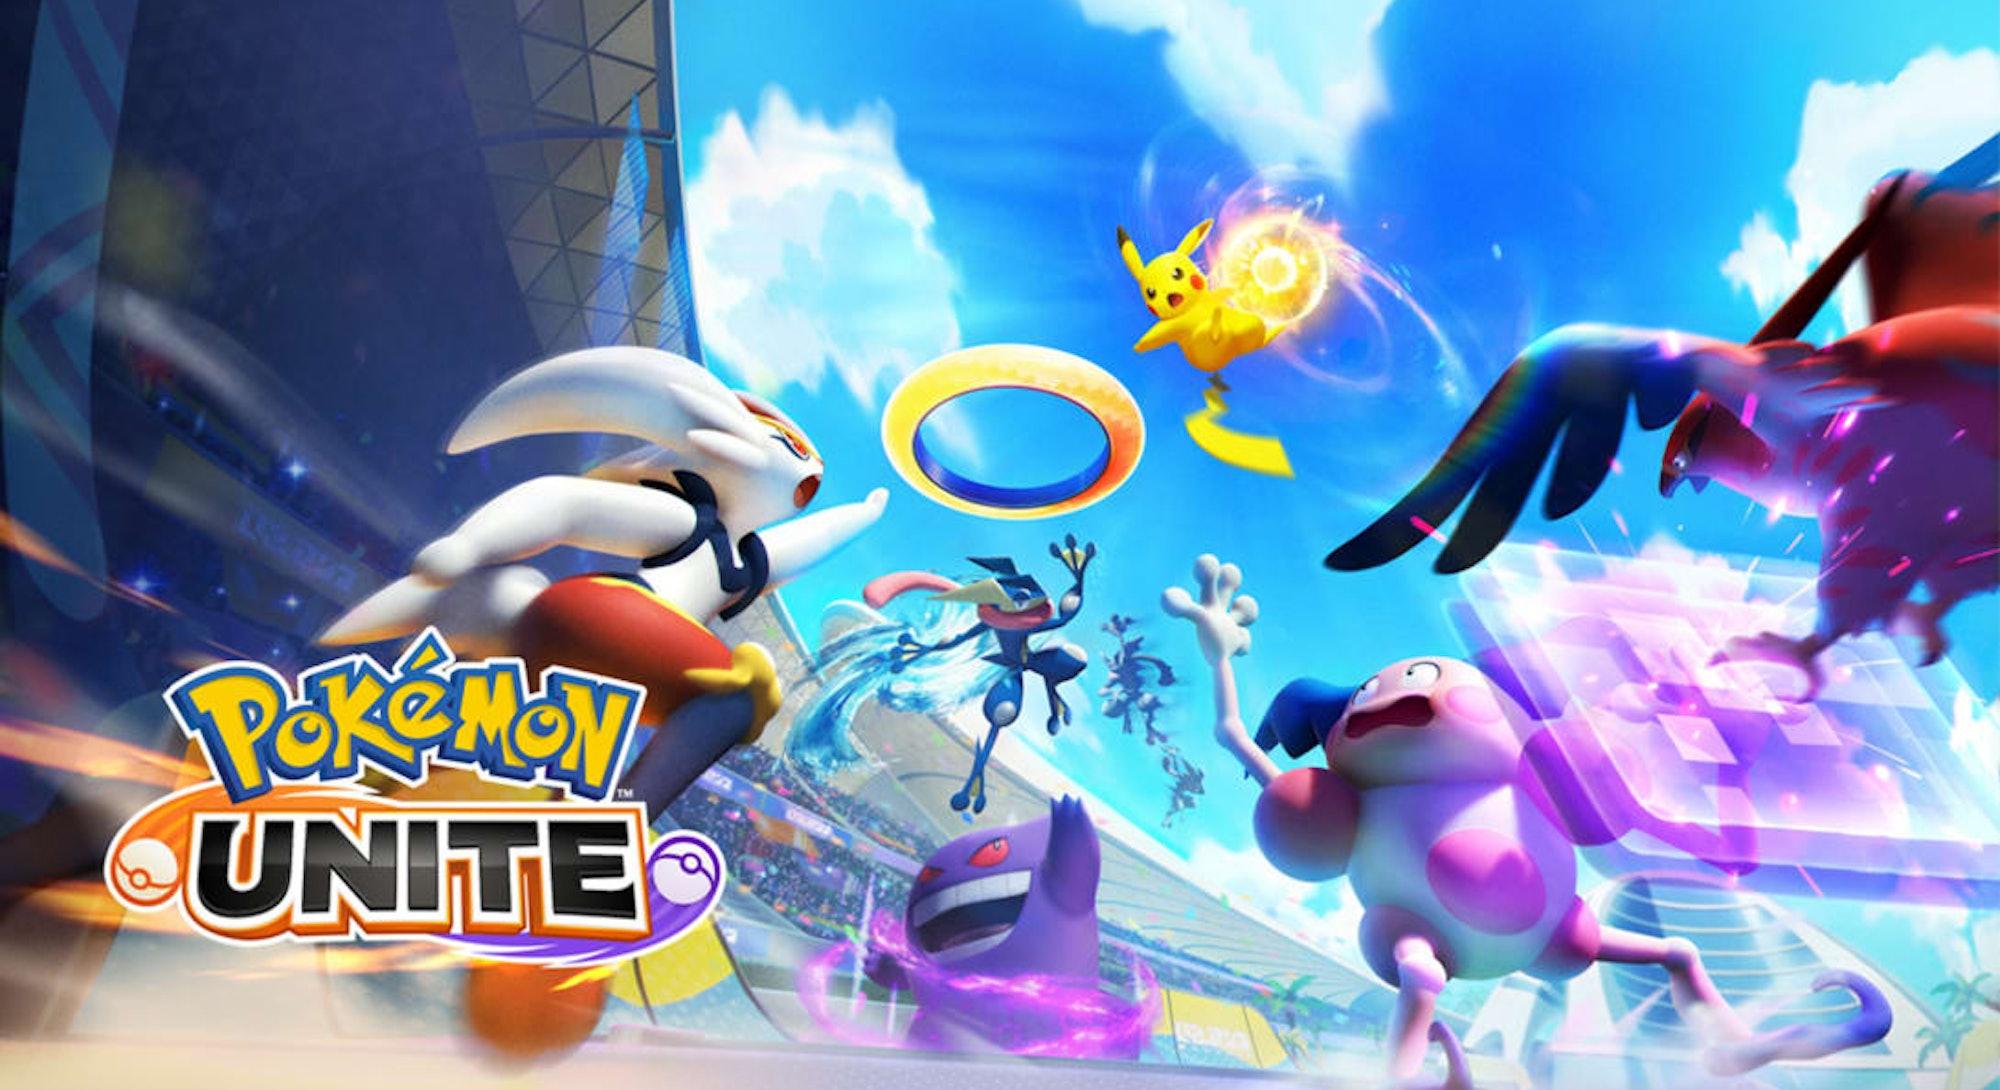 illustration of Pokémon fighting in Pokémon Unite